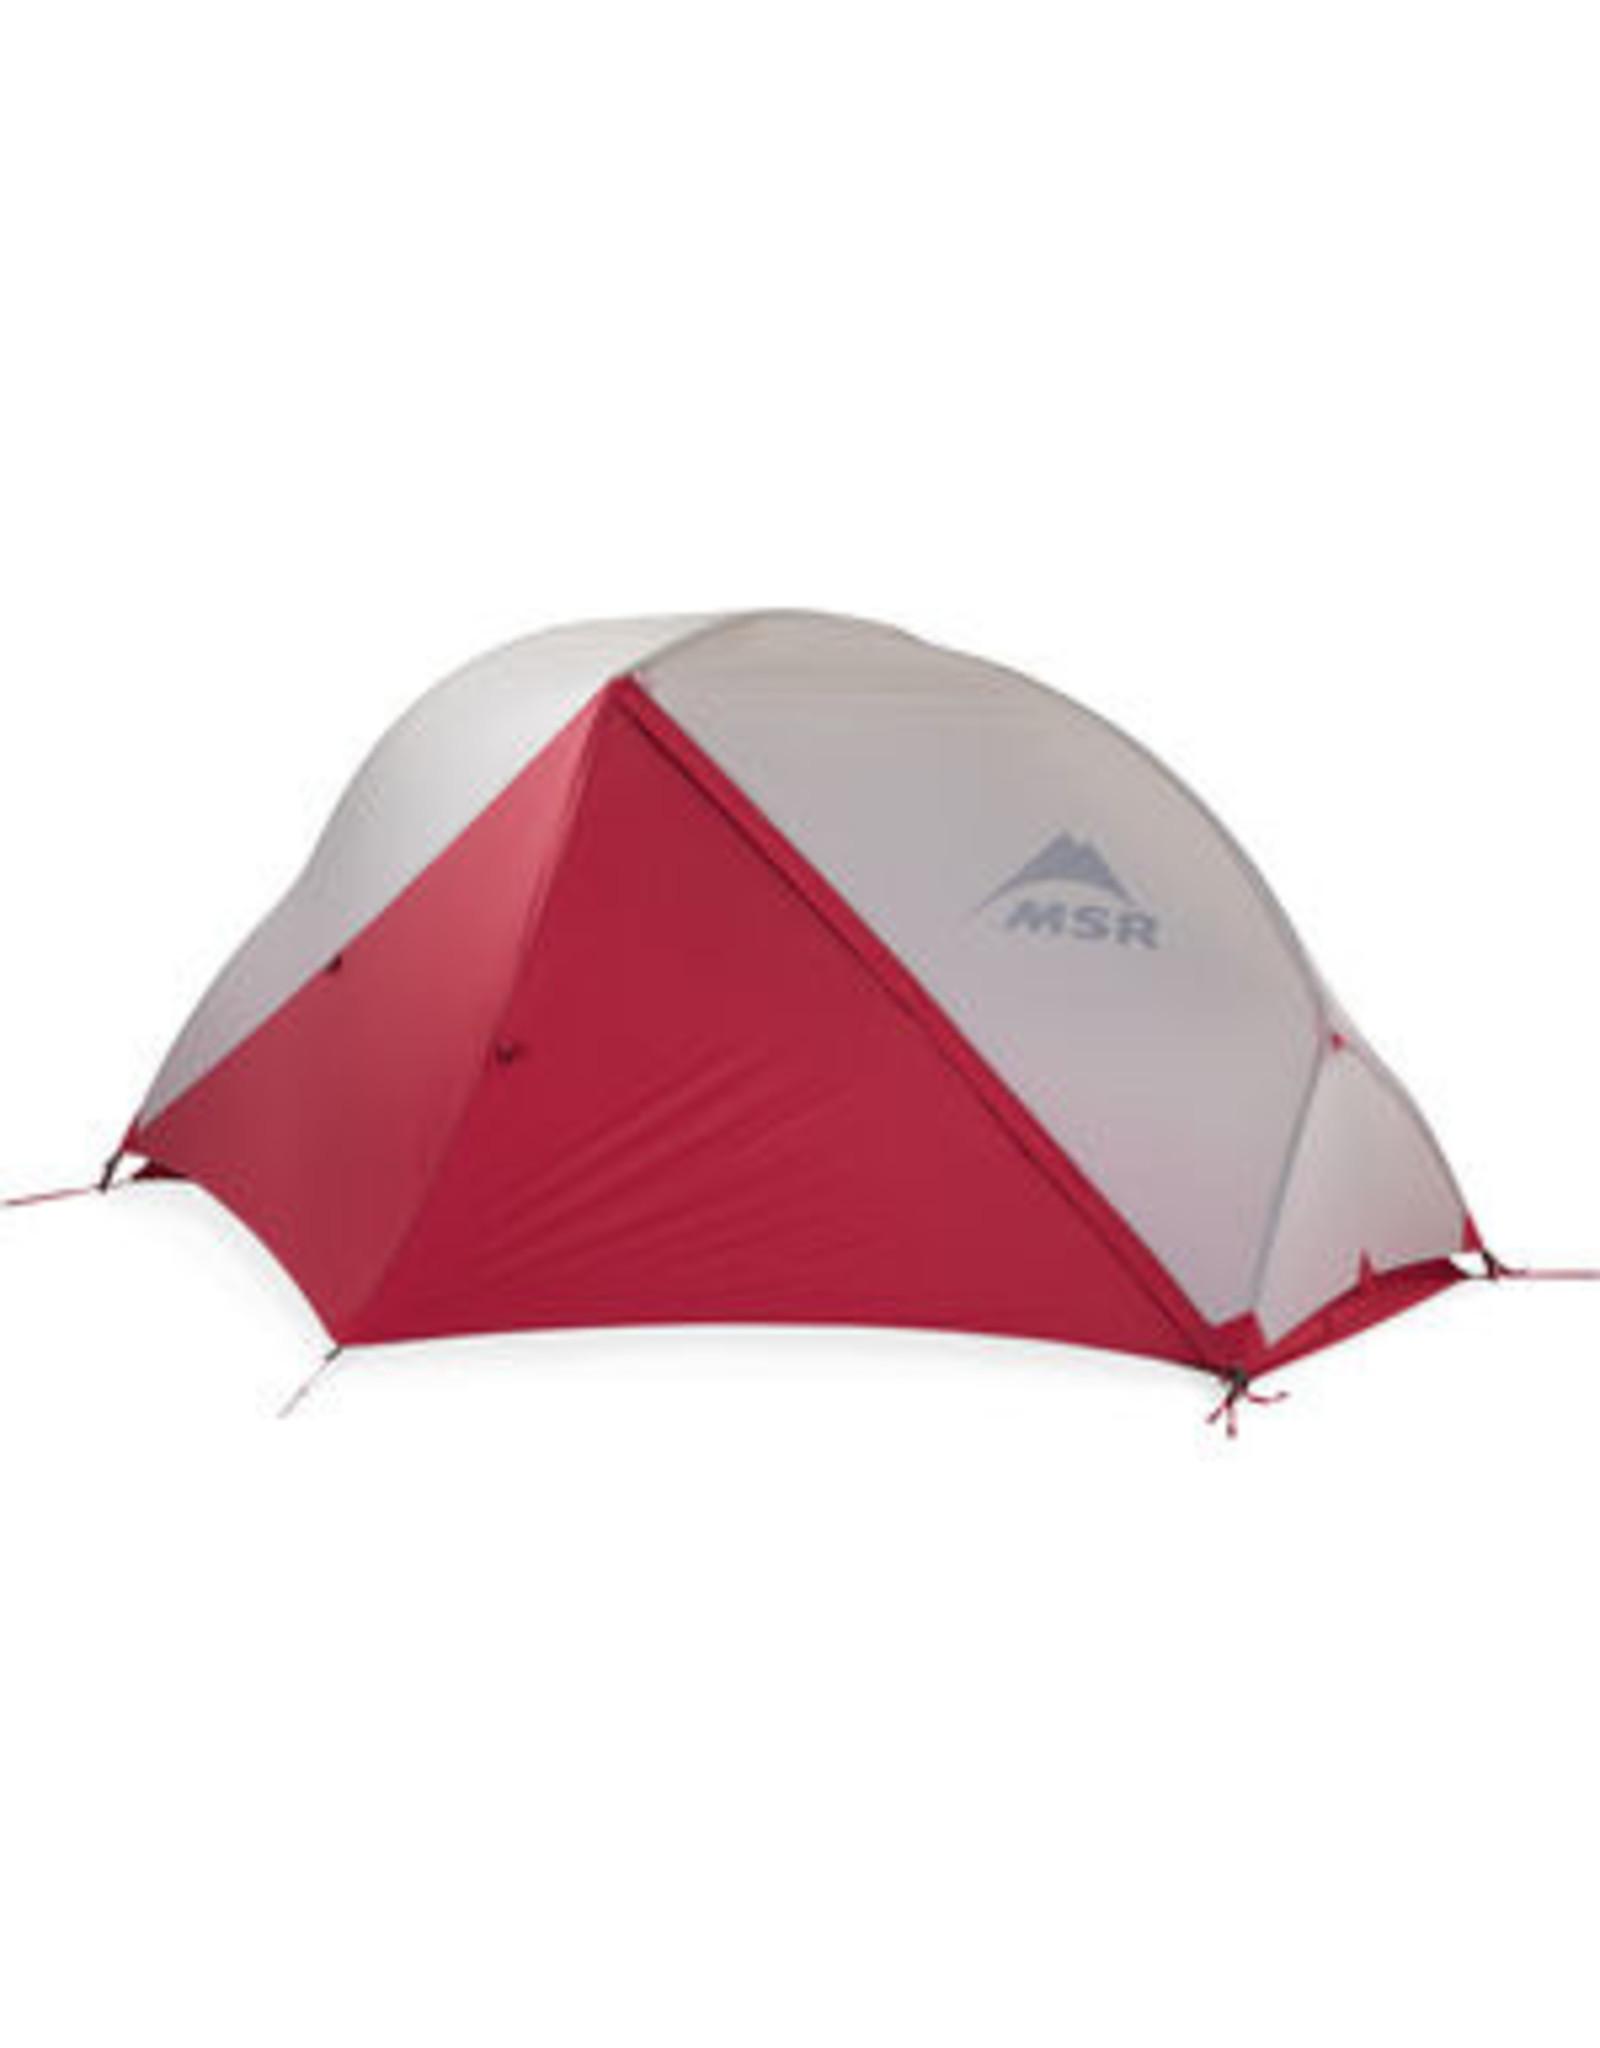 MSR MSR Hubba NX V7 1-Person Tent